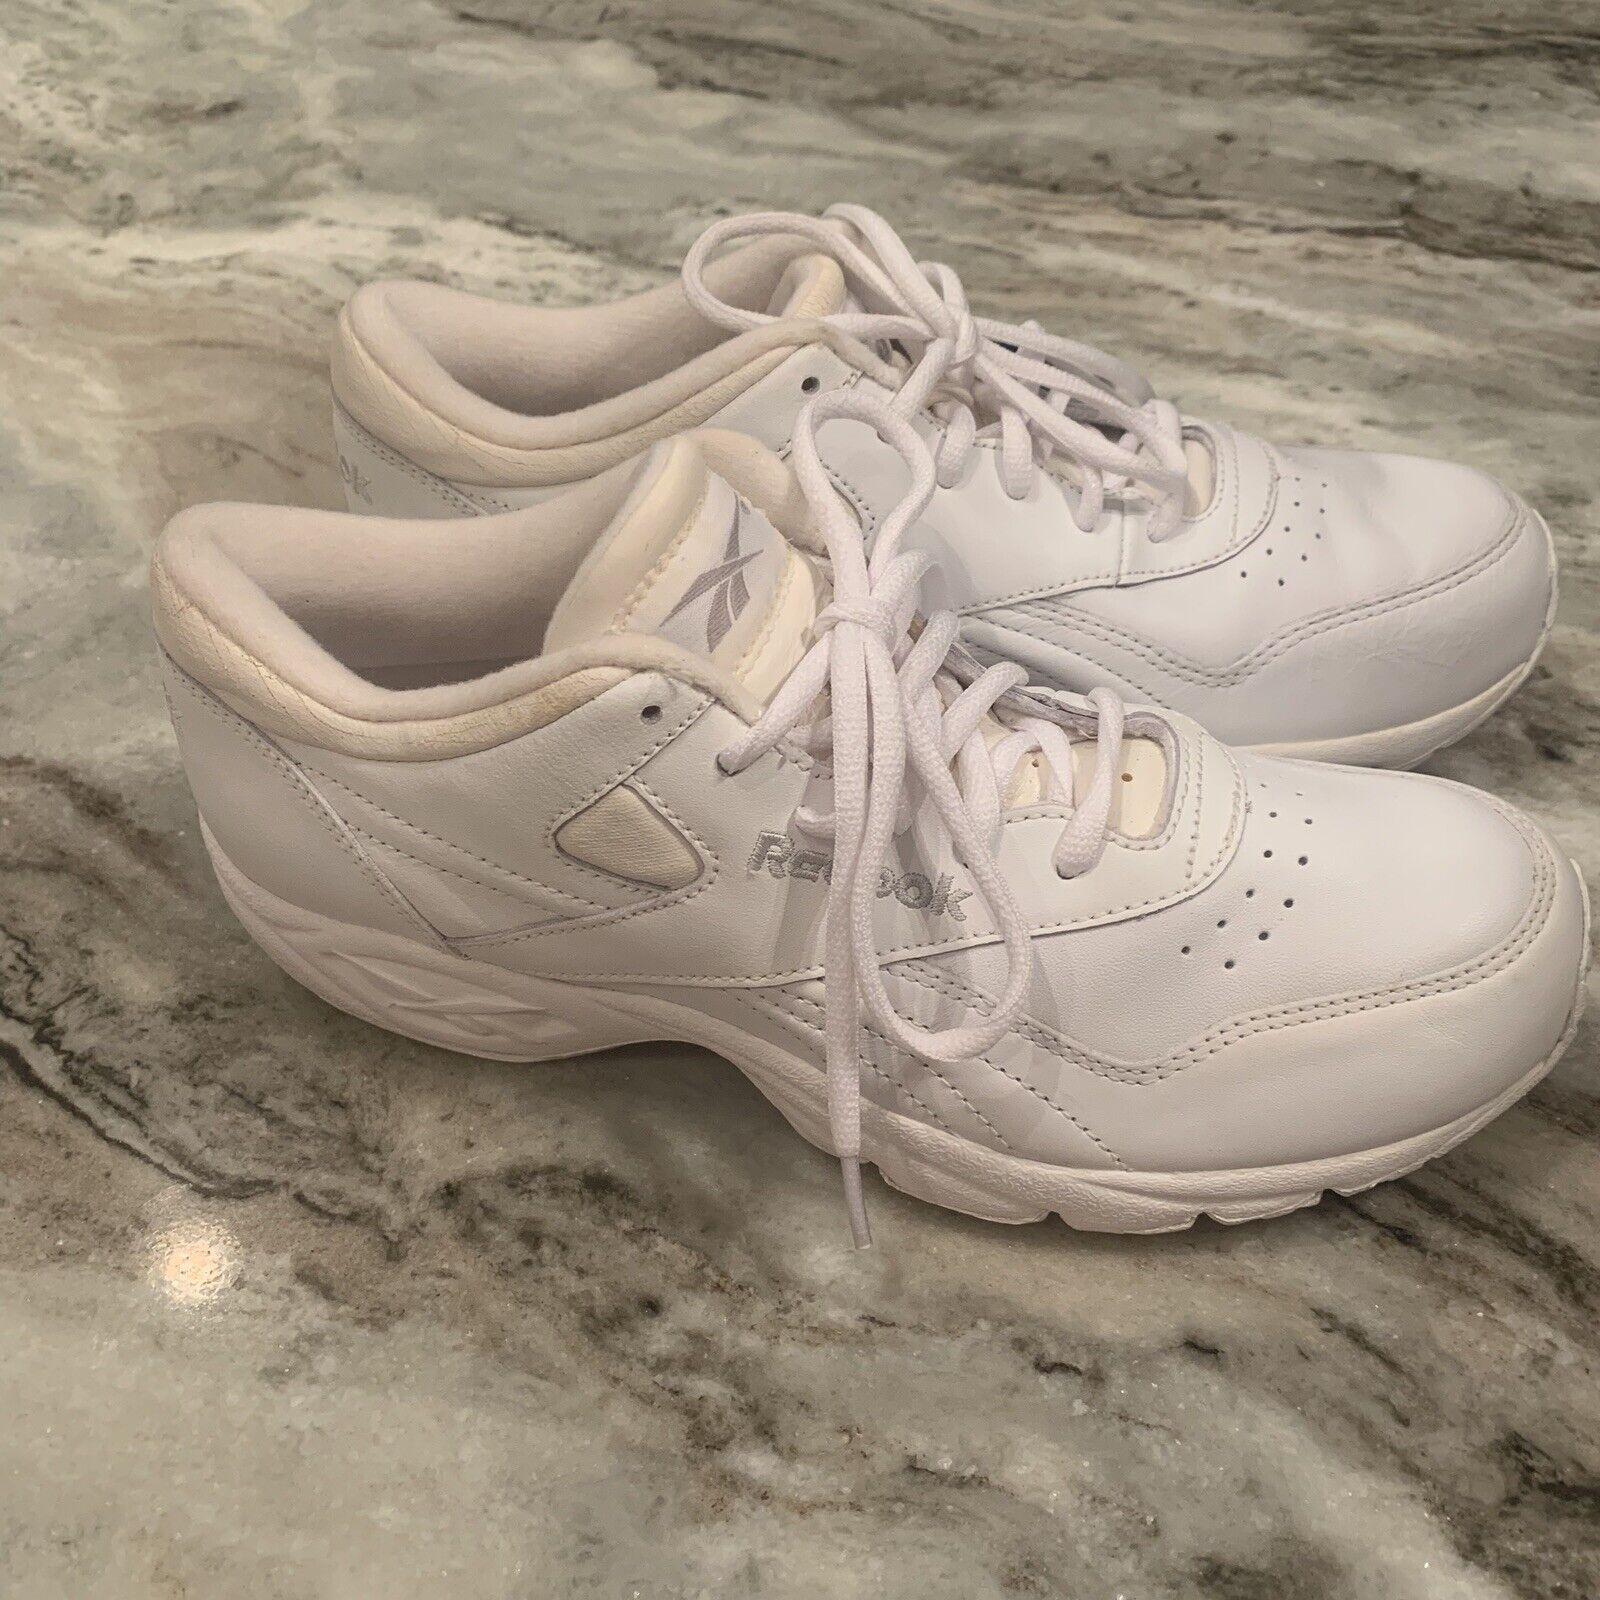 REEBOK 1998 COMFORT PREMIERE women's white 9.5 wide tennis shoe sneakers NWOB